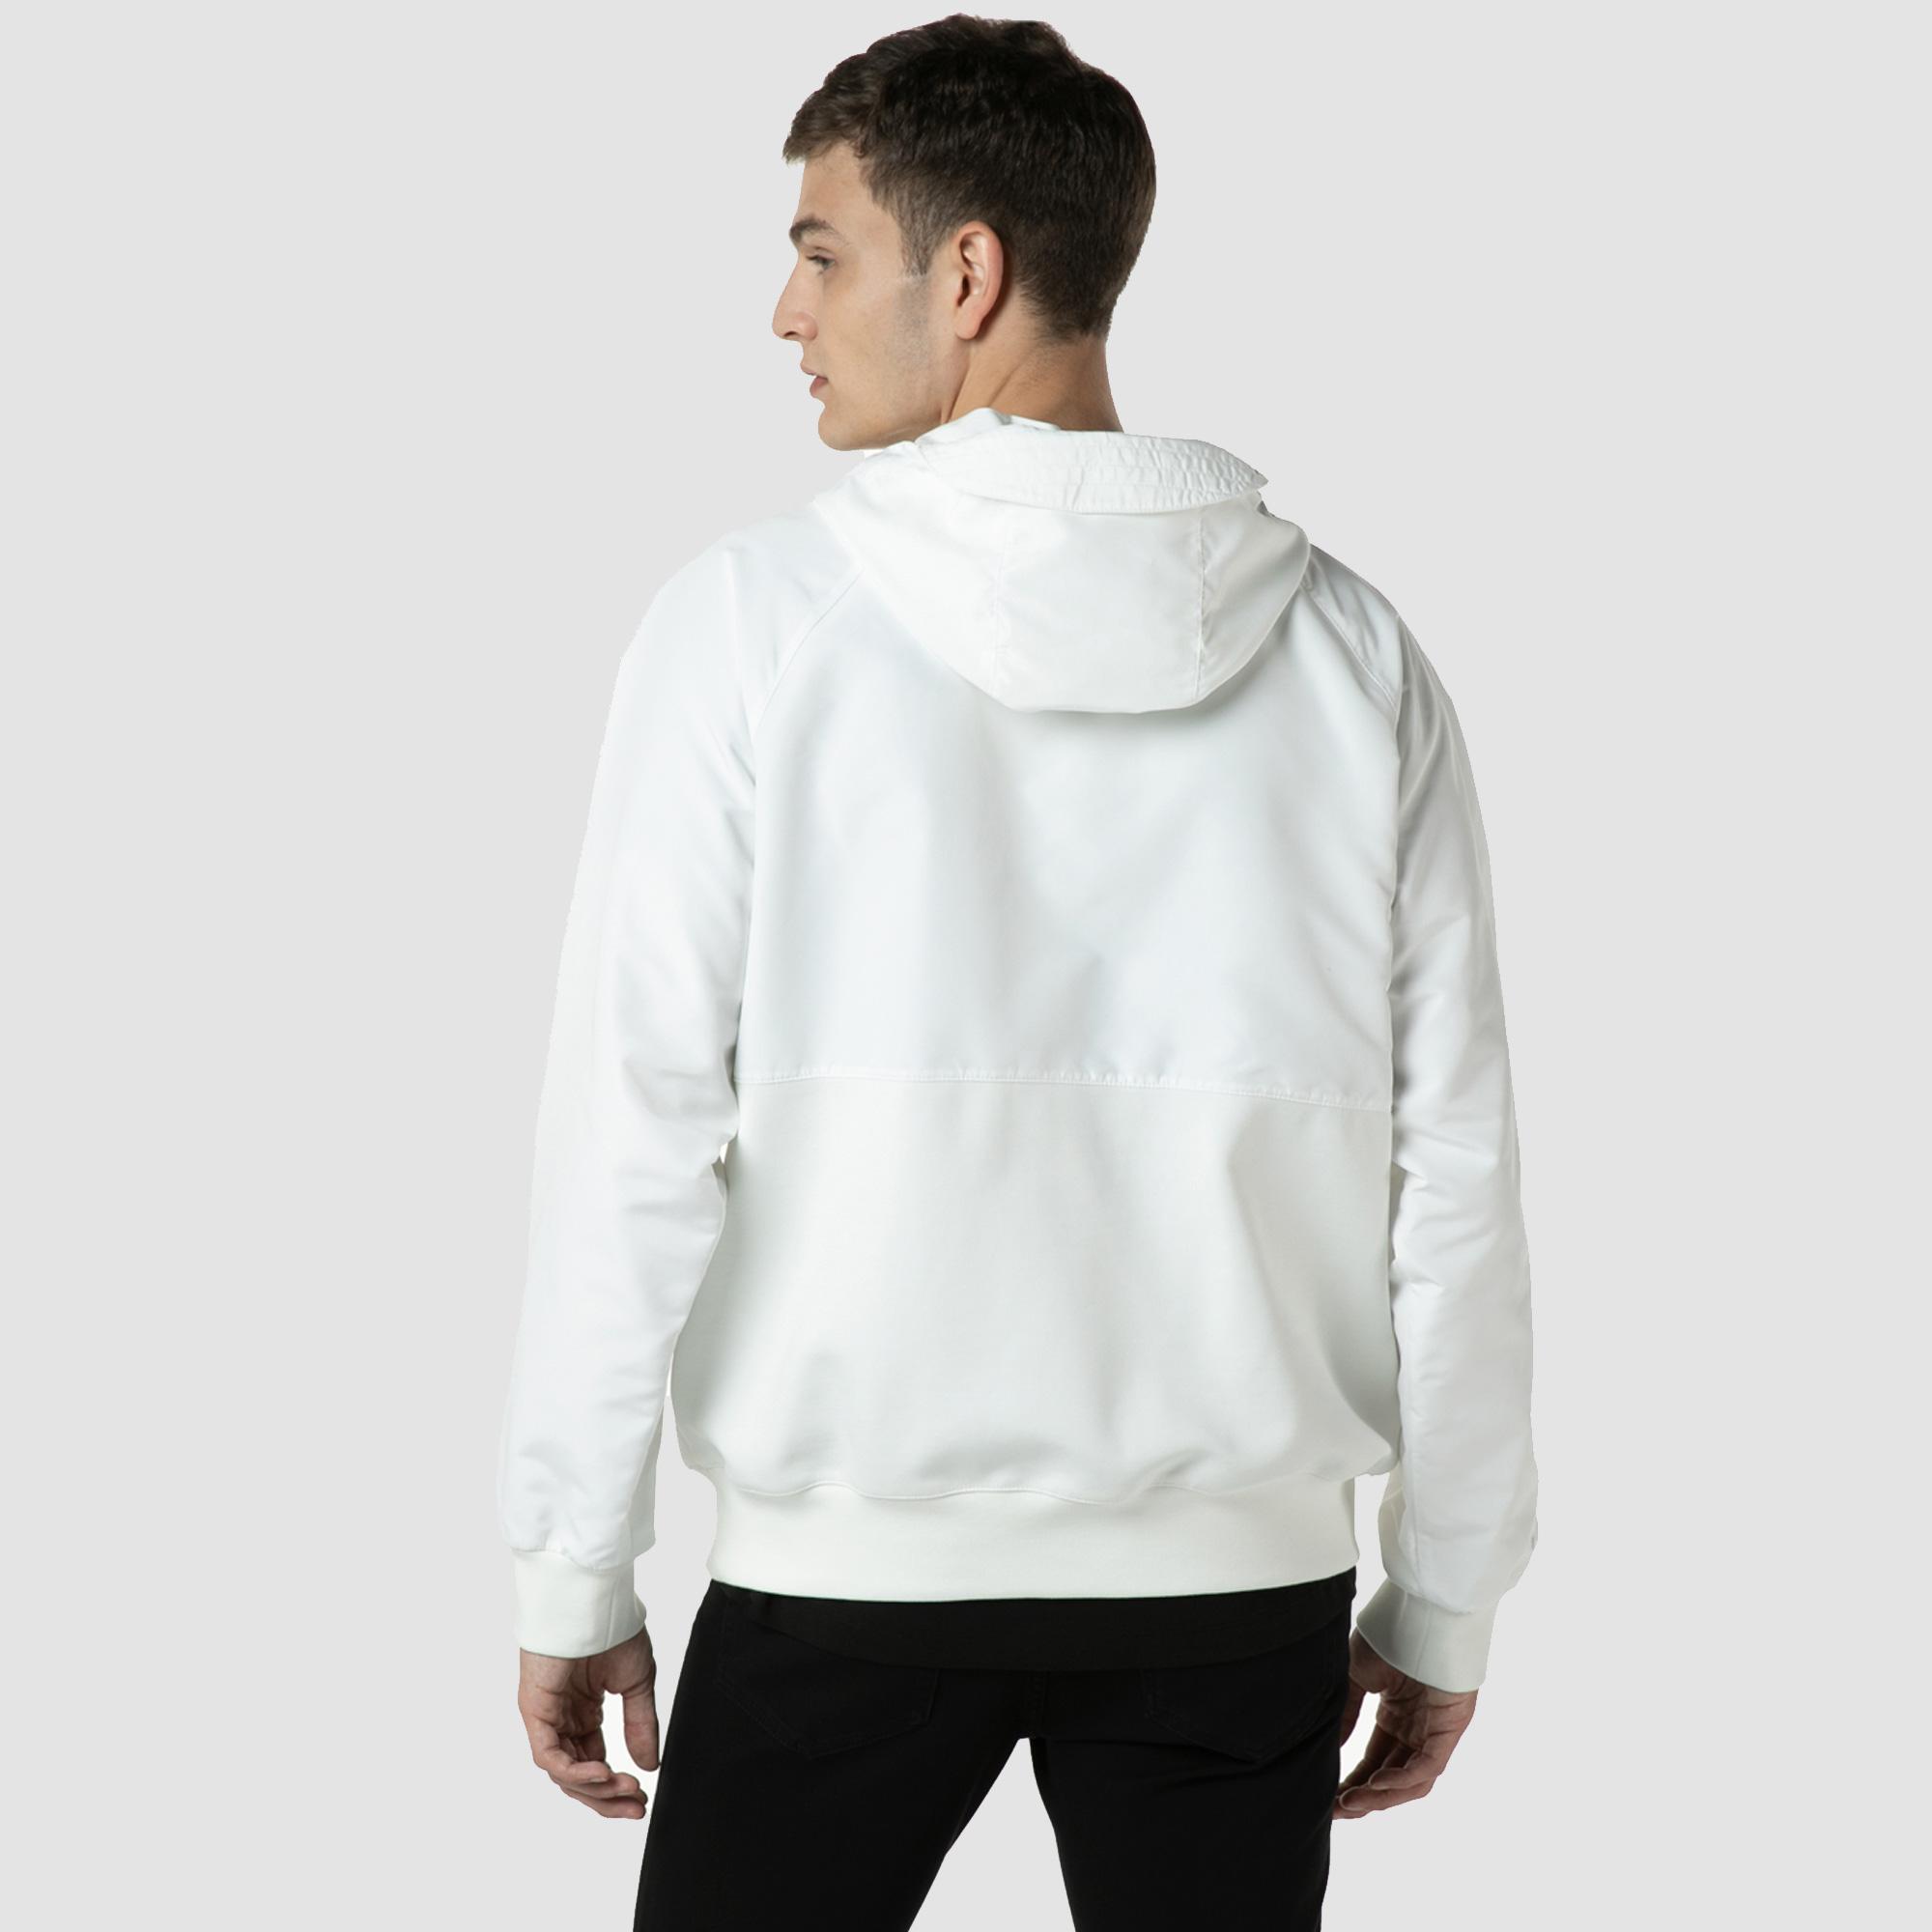 Lacoste Men's Bimaterial Pullover Jacket